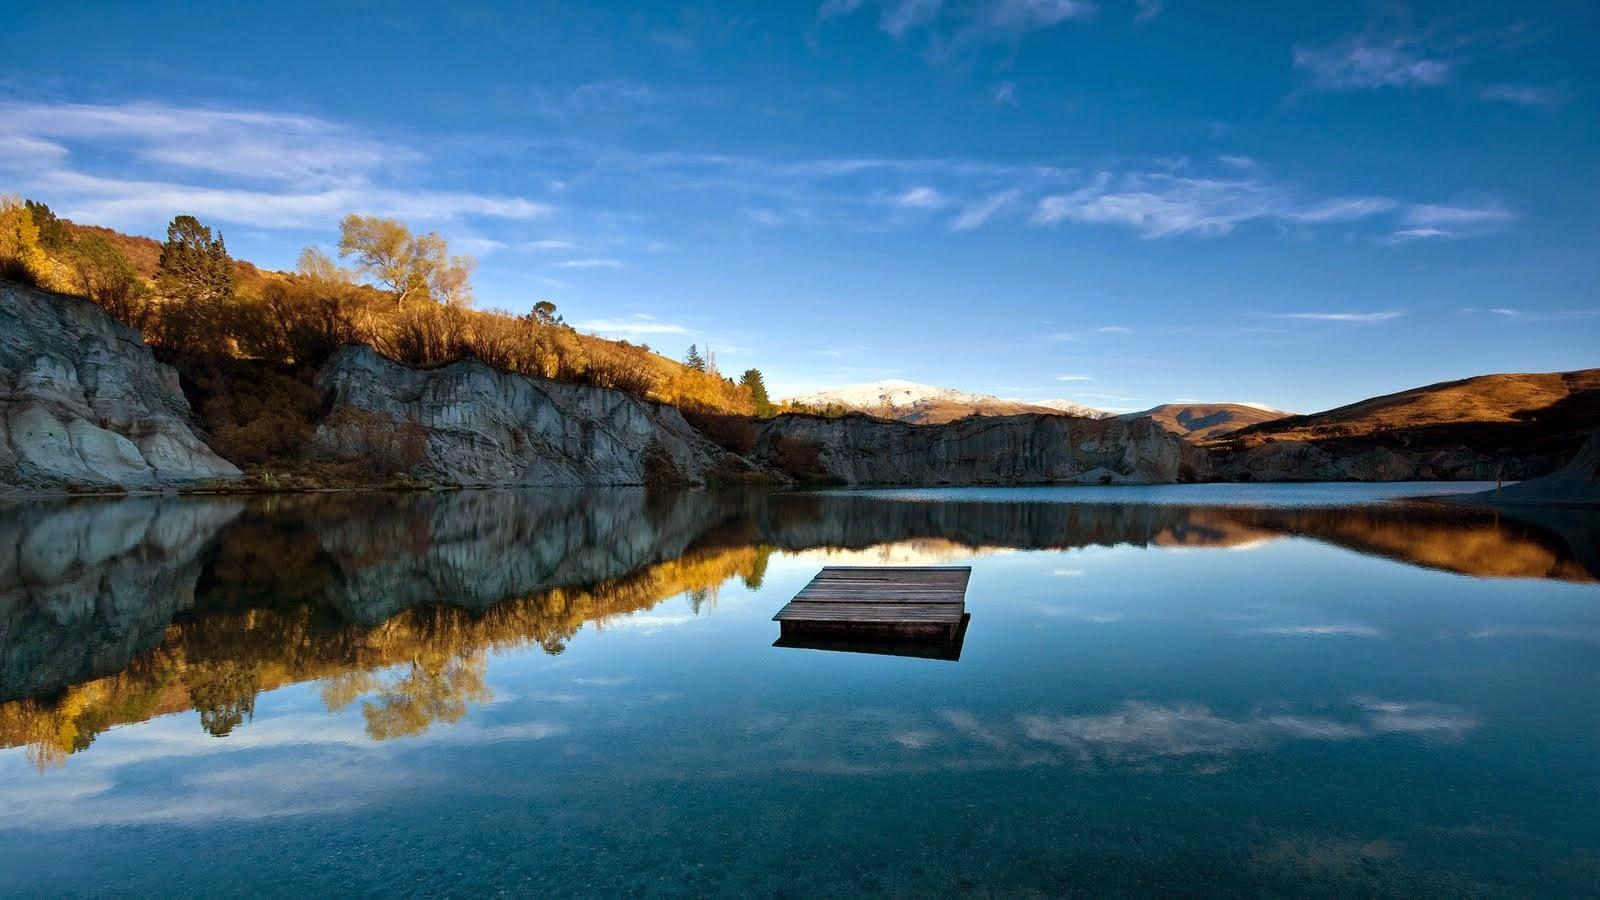 Gambar Pemandangan Kualitas Hd  Kumpulan Gambar Bagus